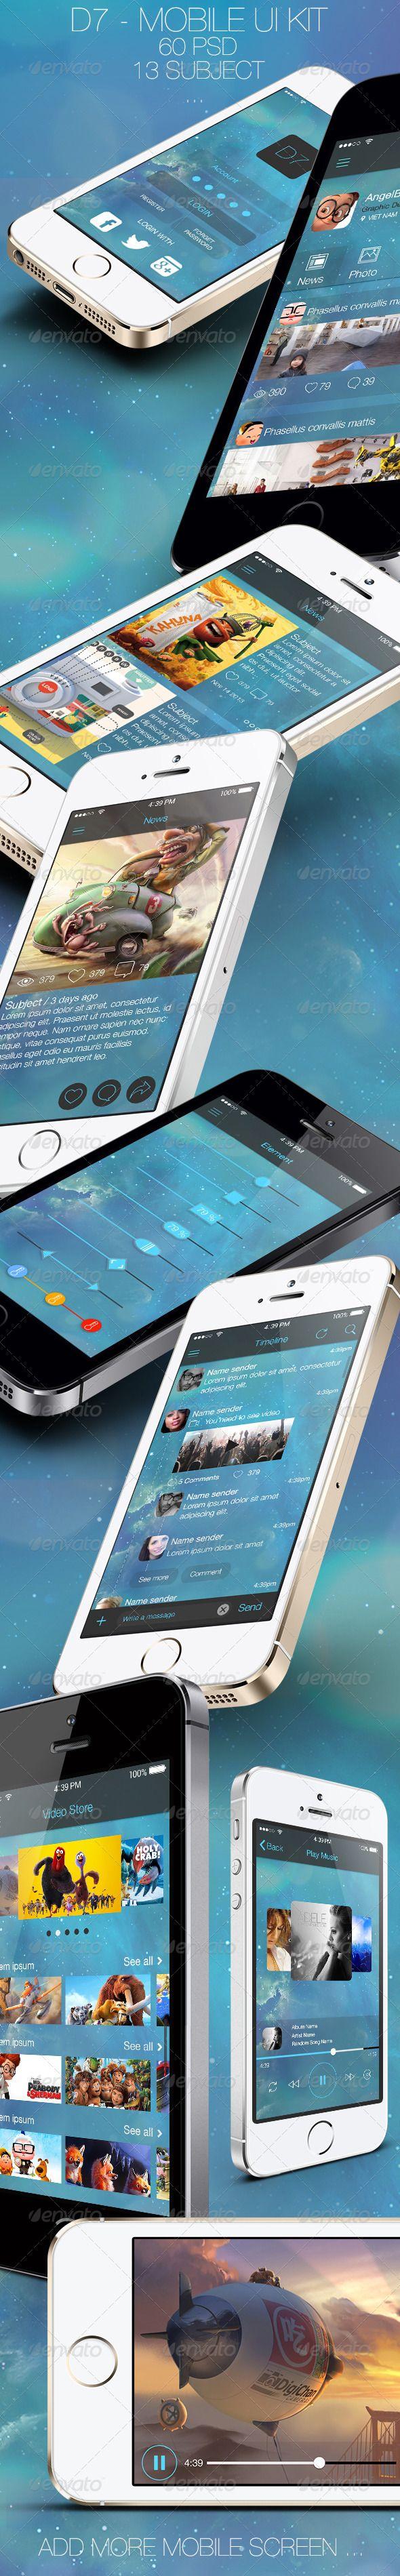 D7 - Mobile UI Kit - #User #Interfaces #Web #Elements Download here: https://graphicriver.net/item/d7-mobile-ui-kit/6153749?ref=alena994